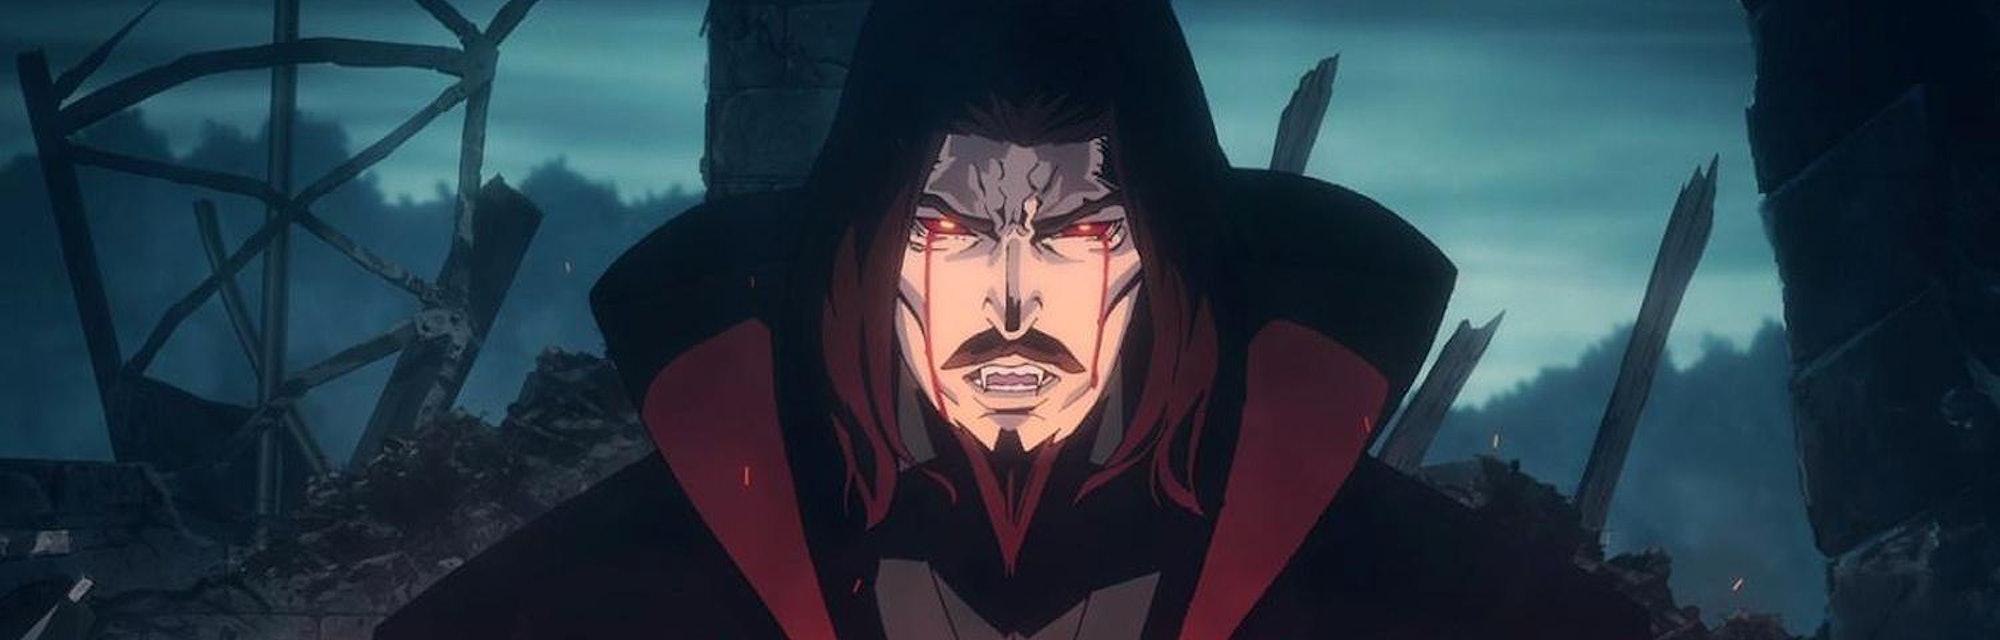 Castlevania Season 3 Release Date Trailer Plot Villain And